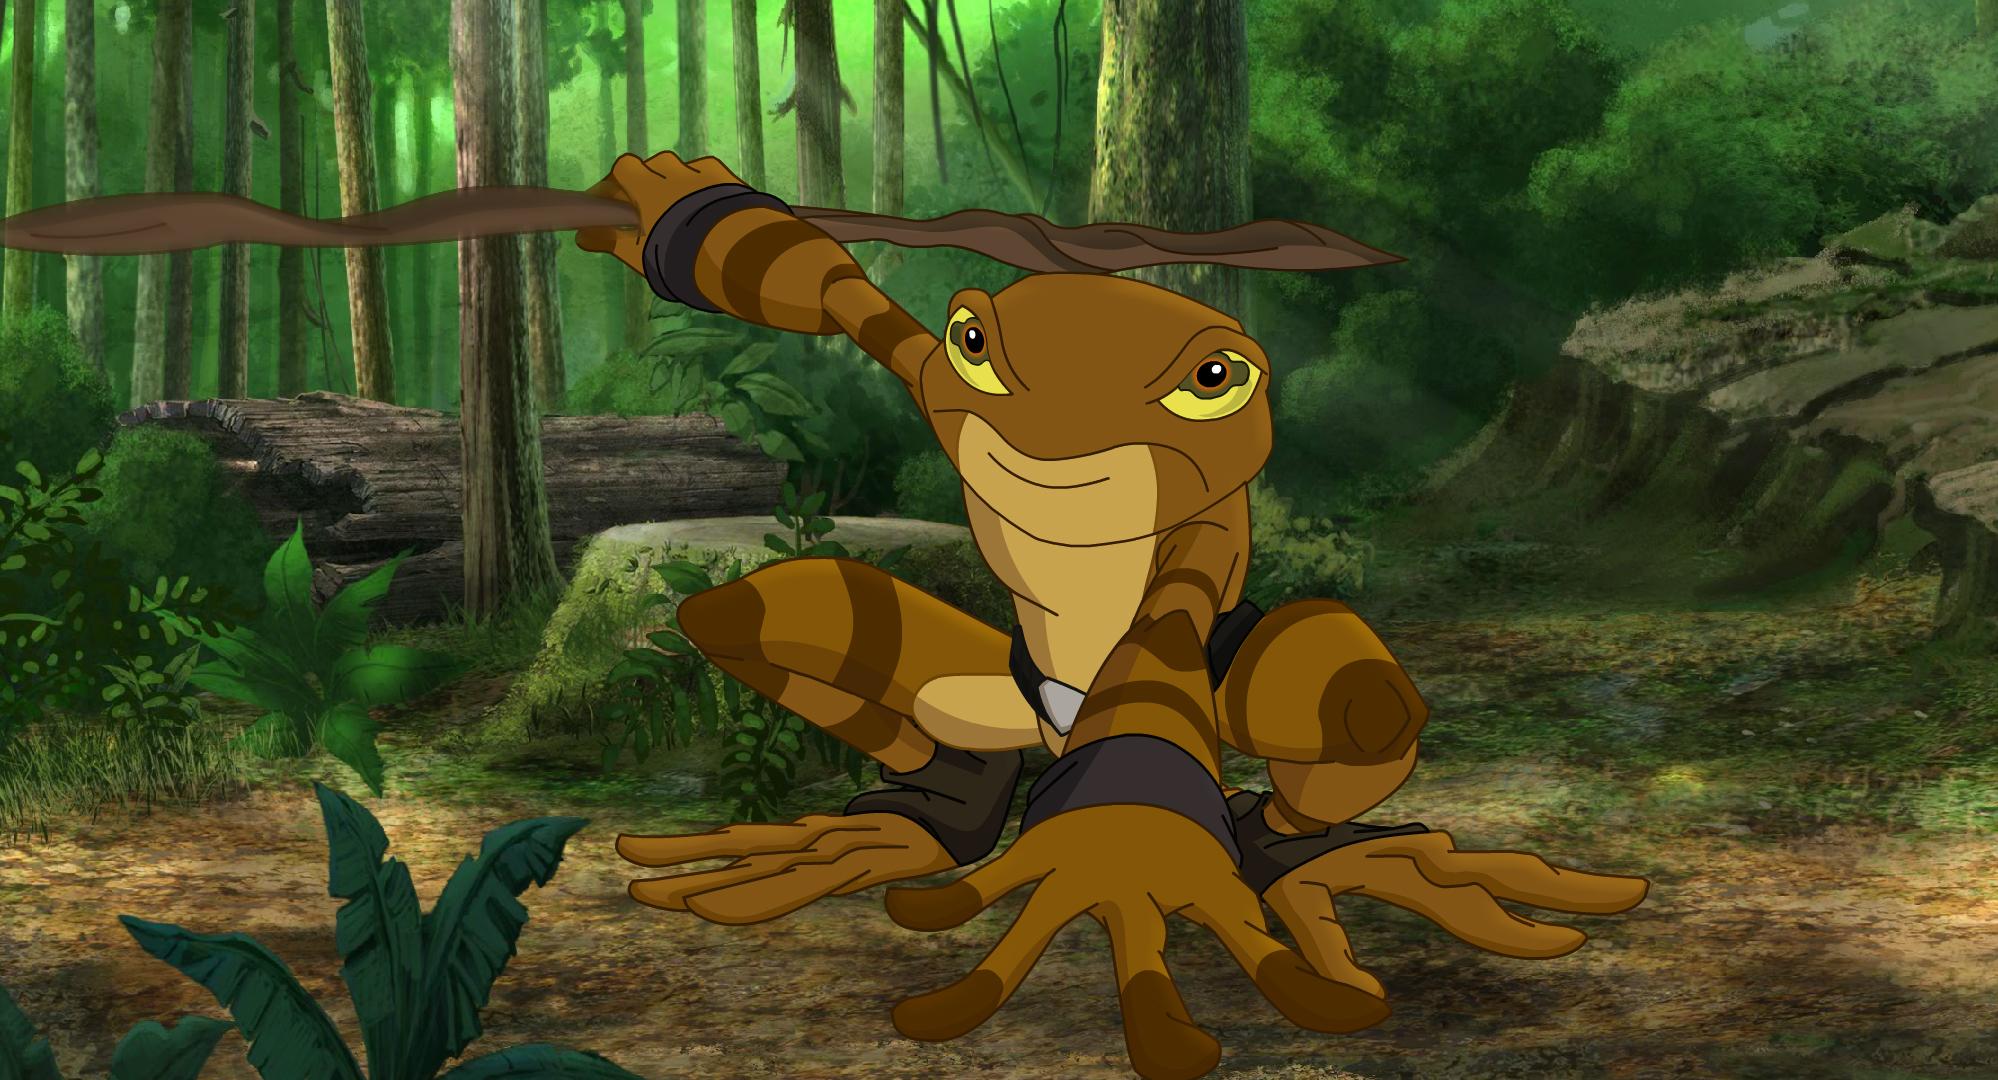 Netflix-Original-Kulipari-An-Army-of-Frogs-Show-Stills_2.jpg